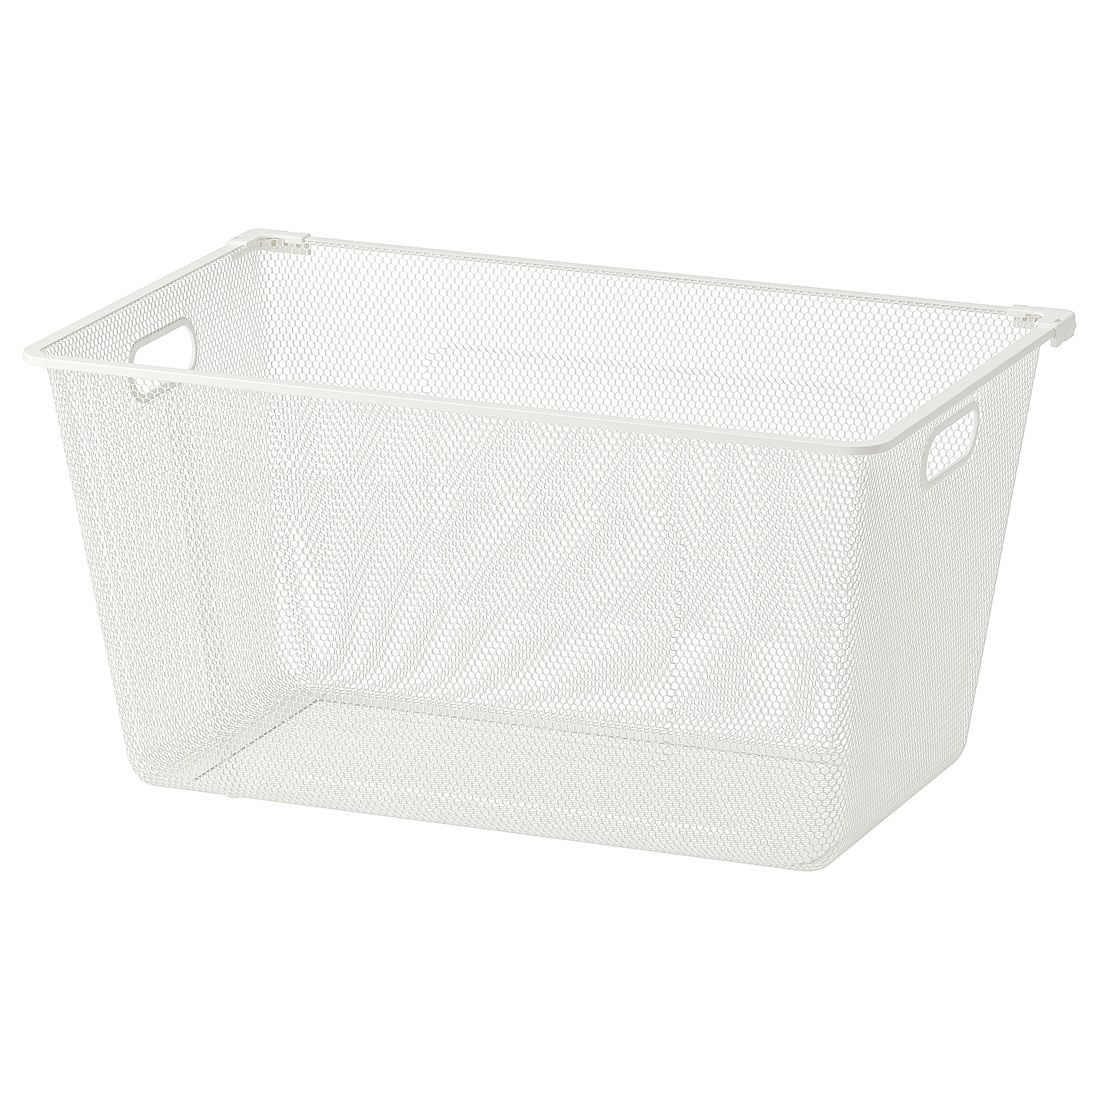 "ALGOT Mesh basket white 15x23 ½x11 ½ "" in 2020 Ikea"